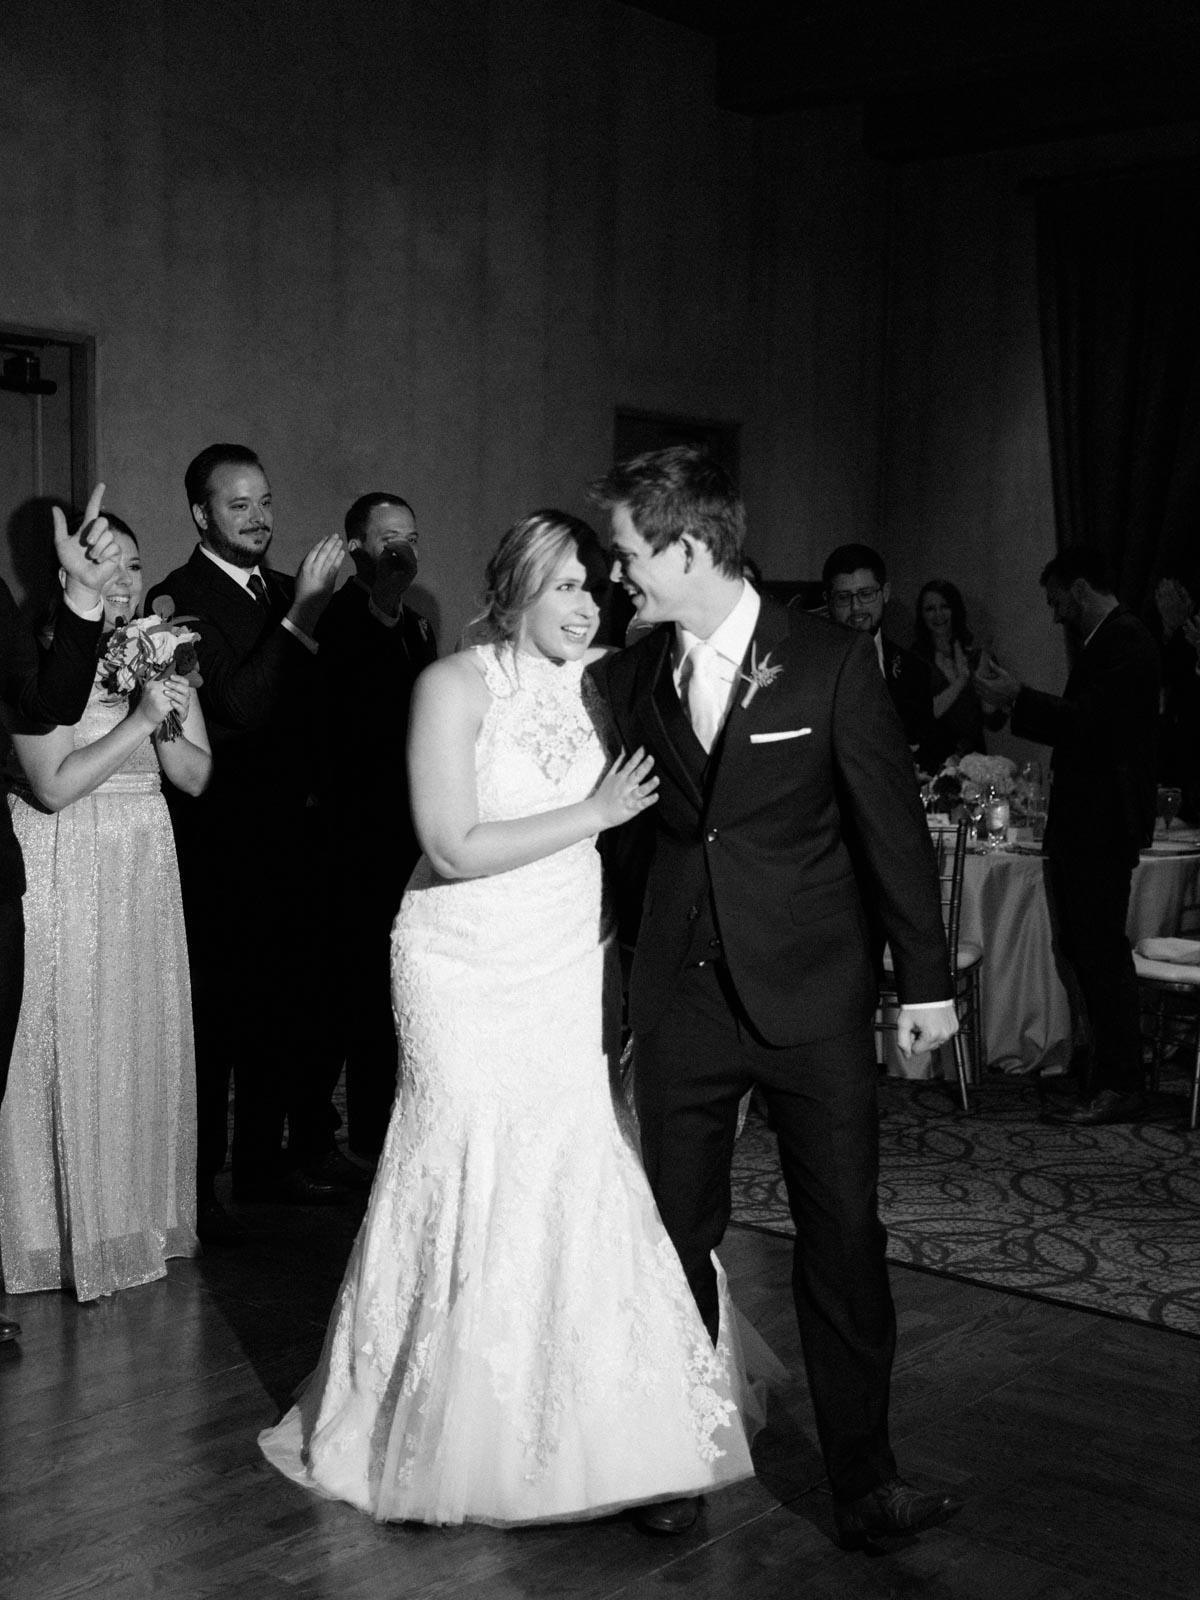 grand-entrance-wedding-2.jpg